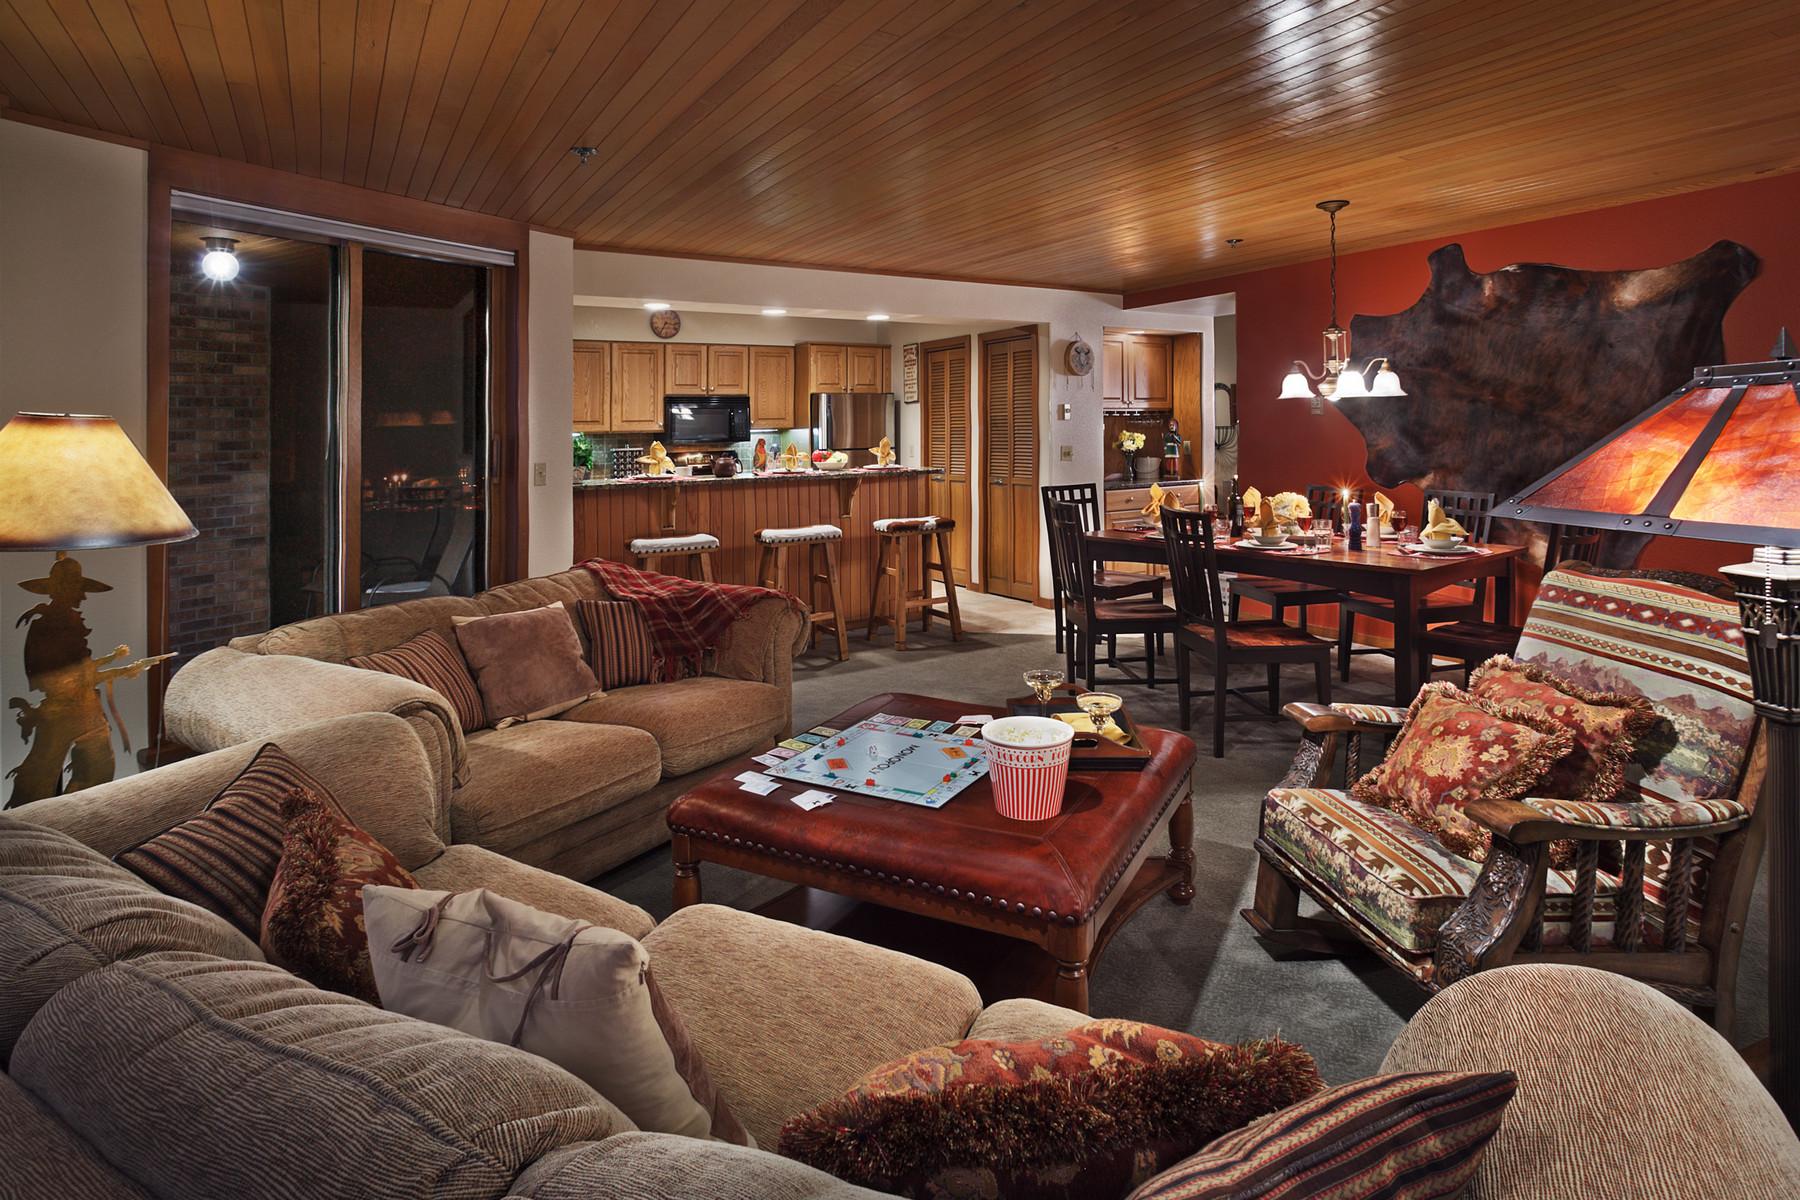 2340 Apres Ski Way, Steamboat Springs, CO 80487